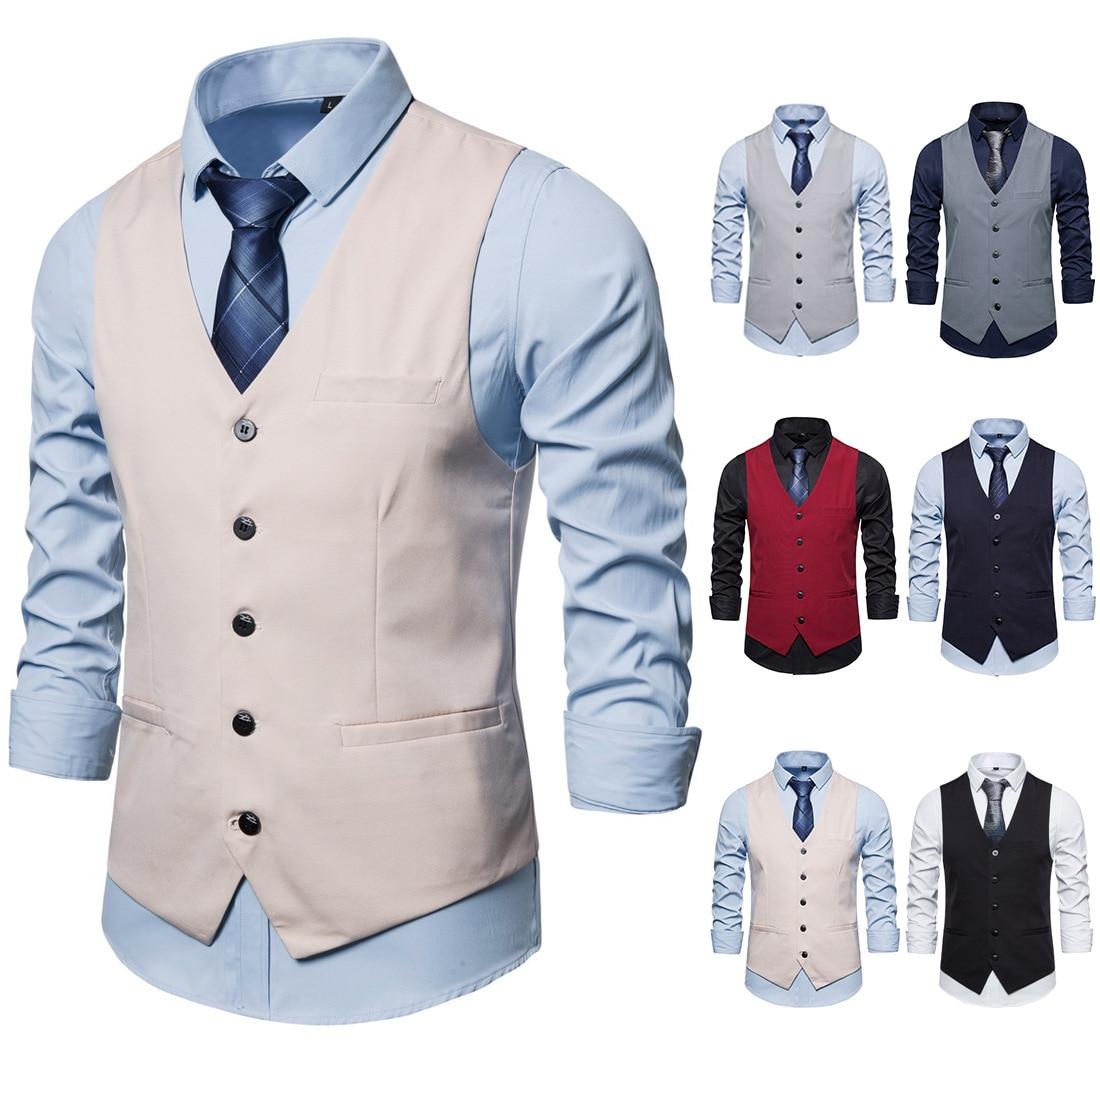 Mens Suit Vest Spring Clothing Business Leisure Single Breasted Male Gentlemen Vest